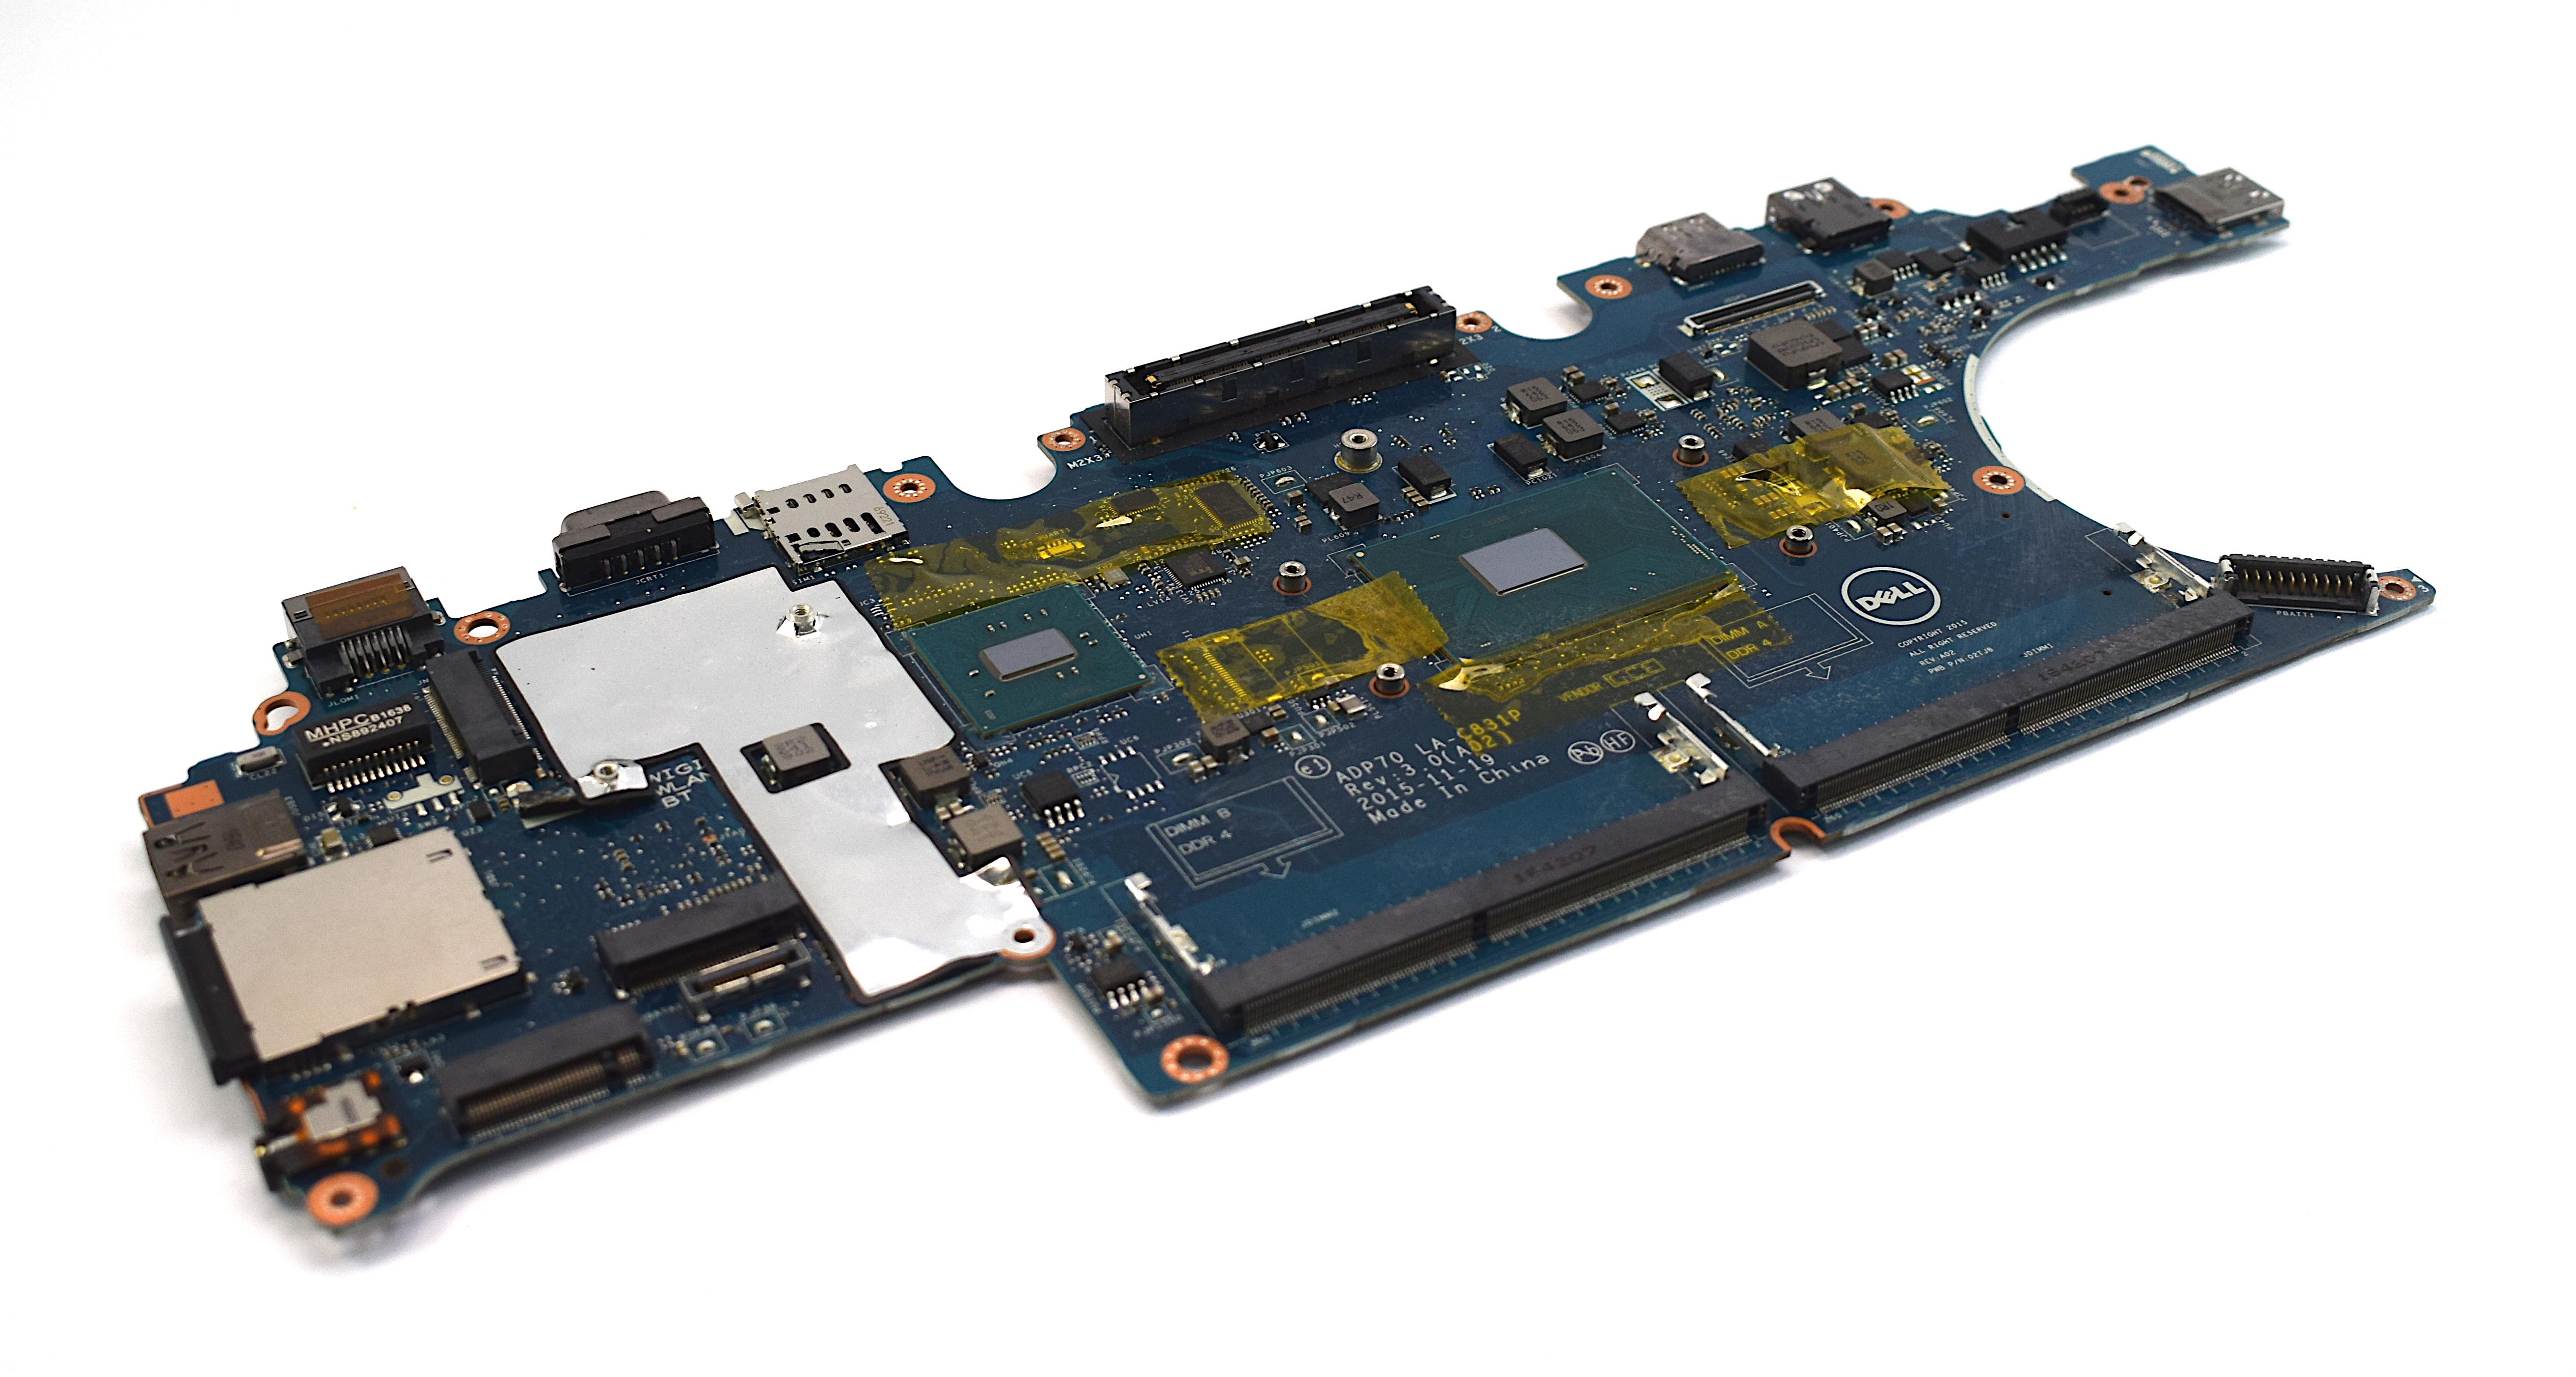 Dell 792TG Latitude E5470 with BGA Intel Core i5-6440HQ Laptop Motherboard